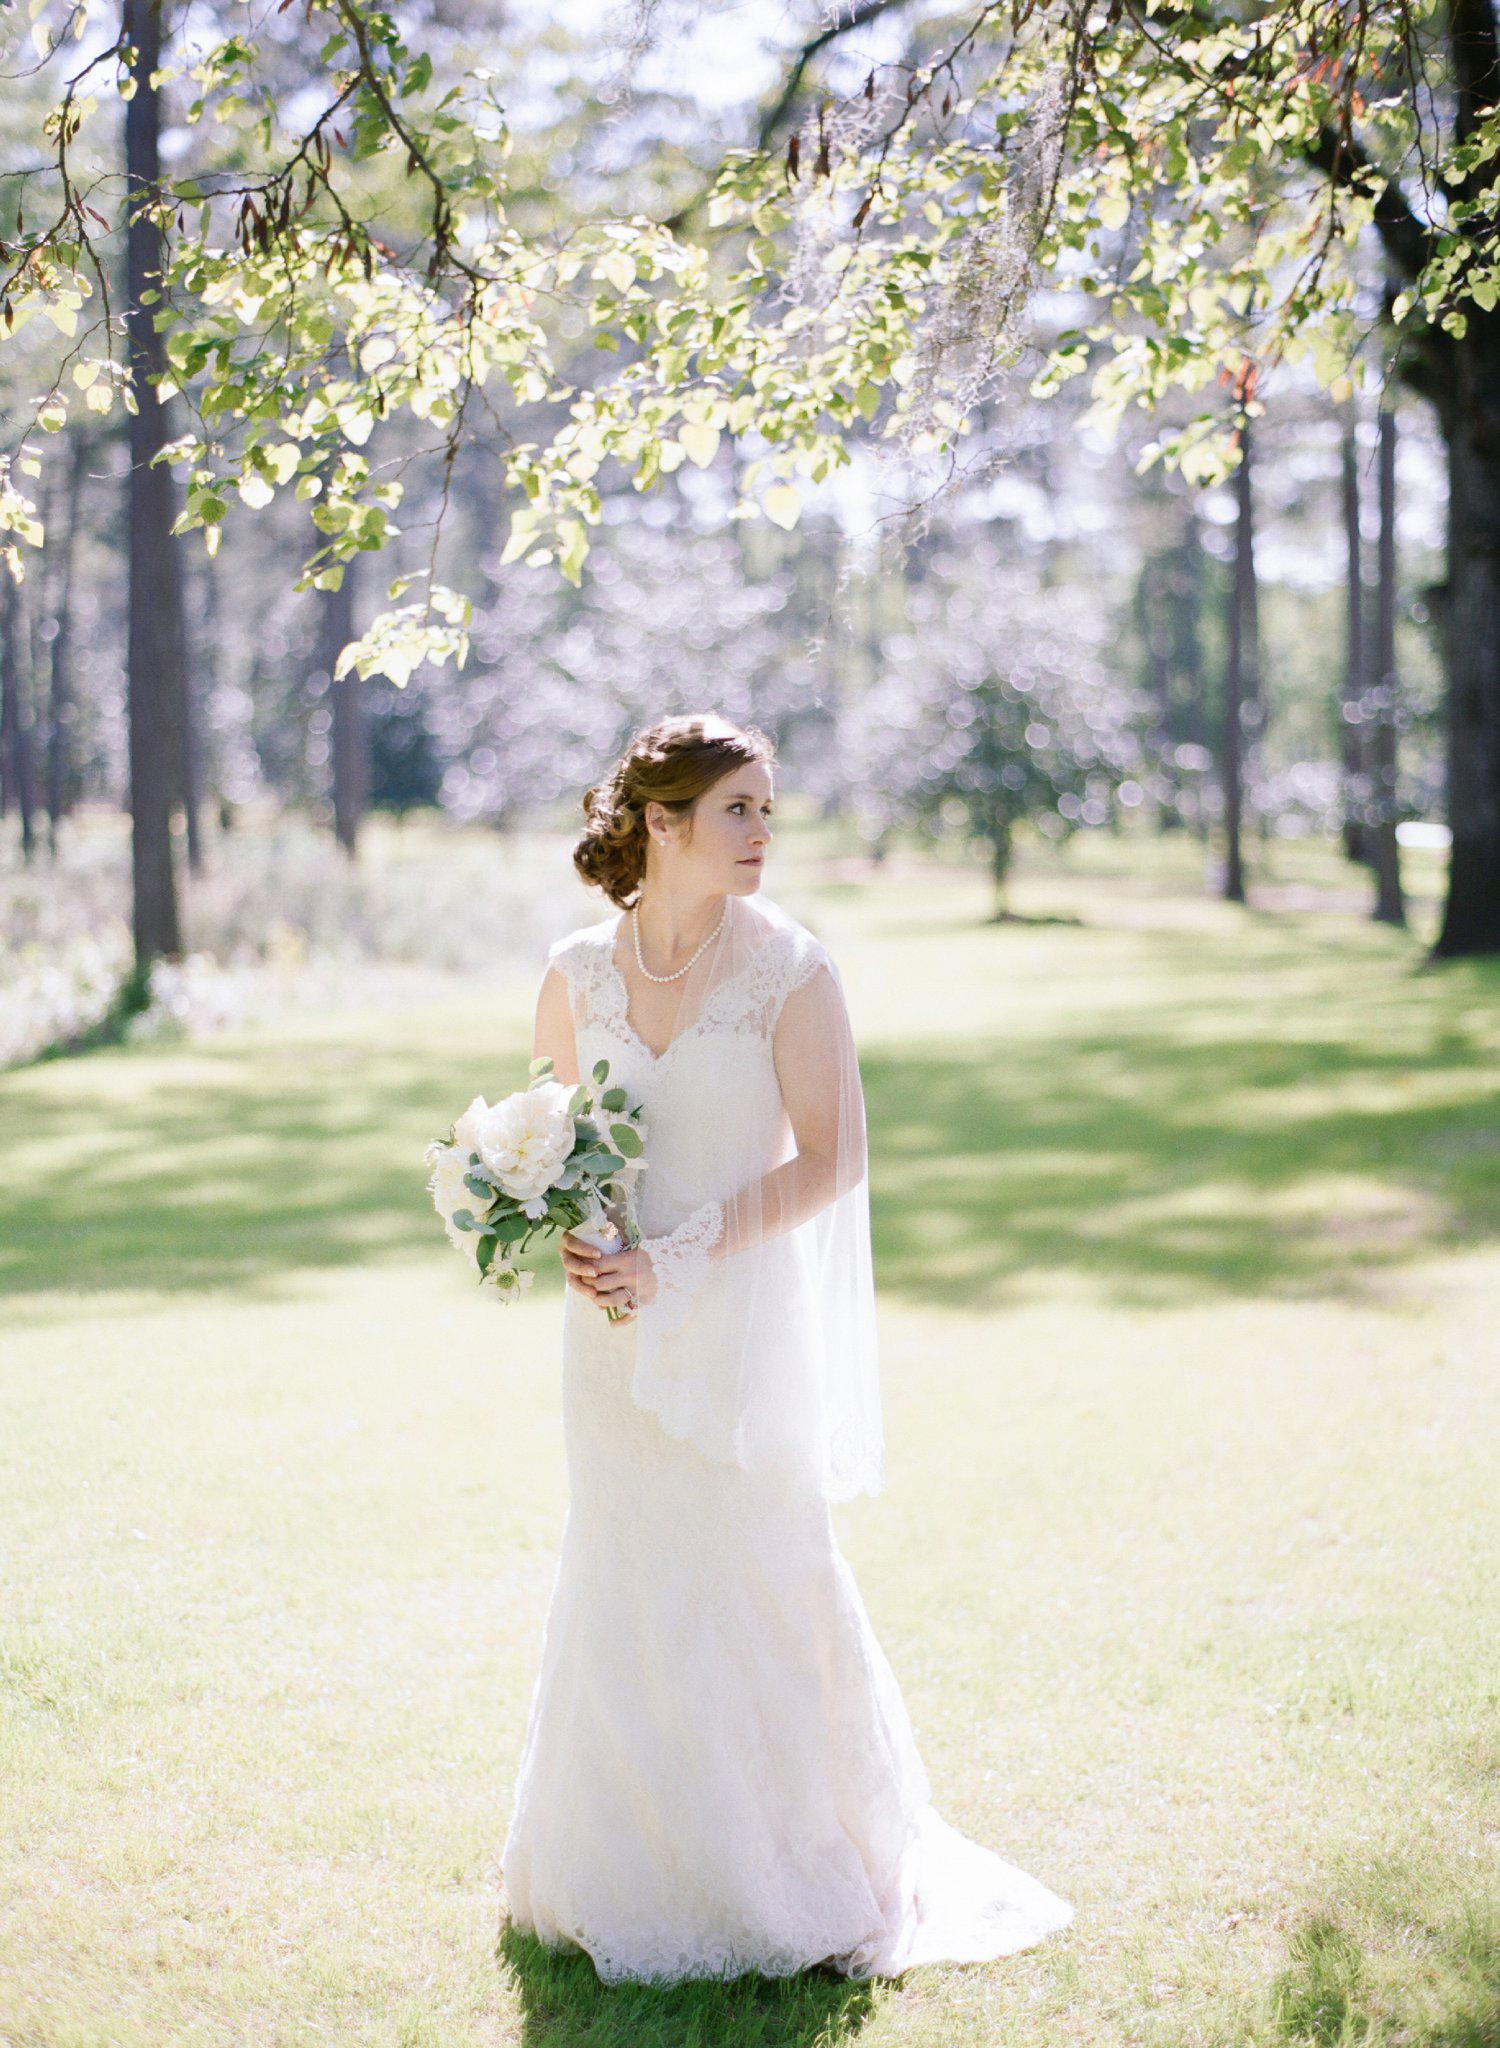 ecila farm wedding albany georgia wedding photographer shannon griffin photography-31.jpg